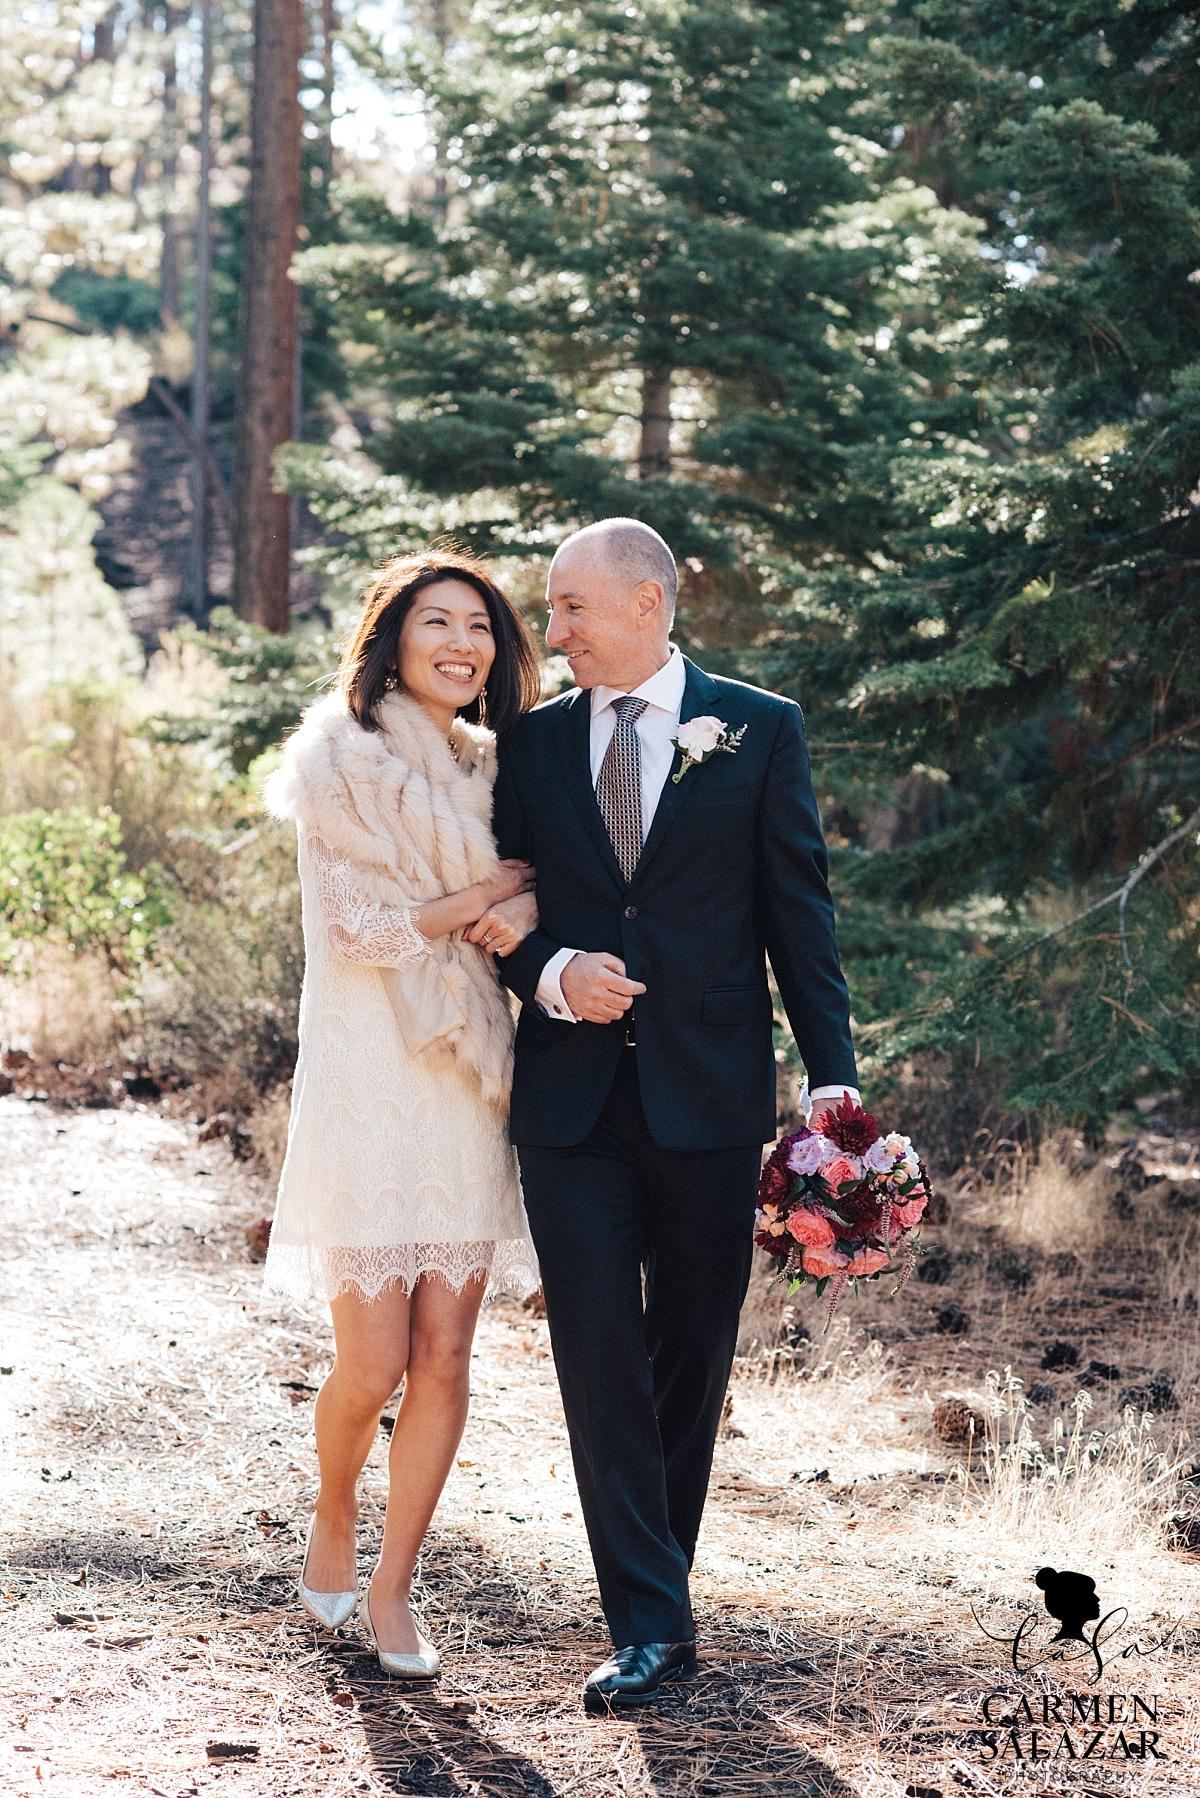 Zephyr Cove NV wedding photography - Carmen Salazar